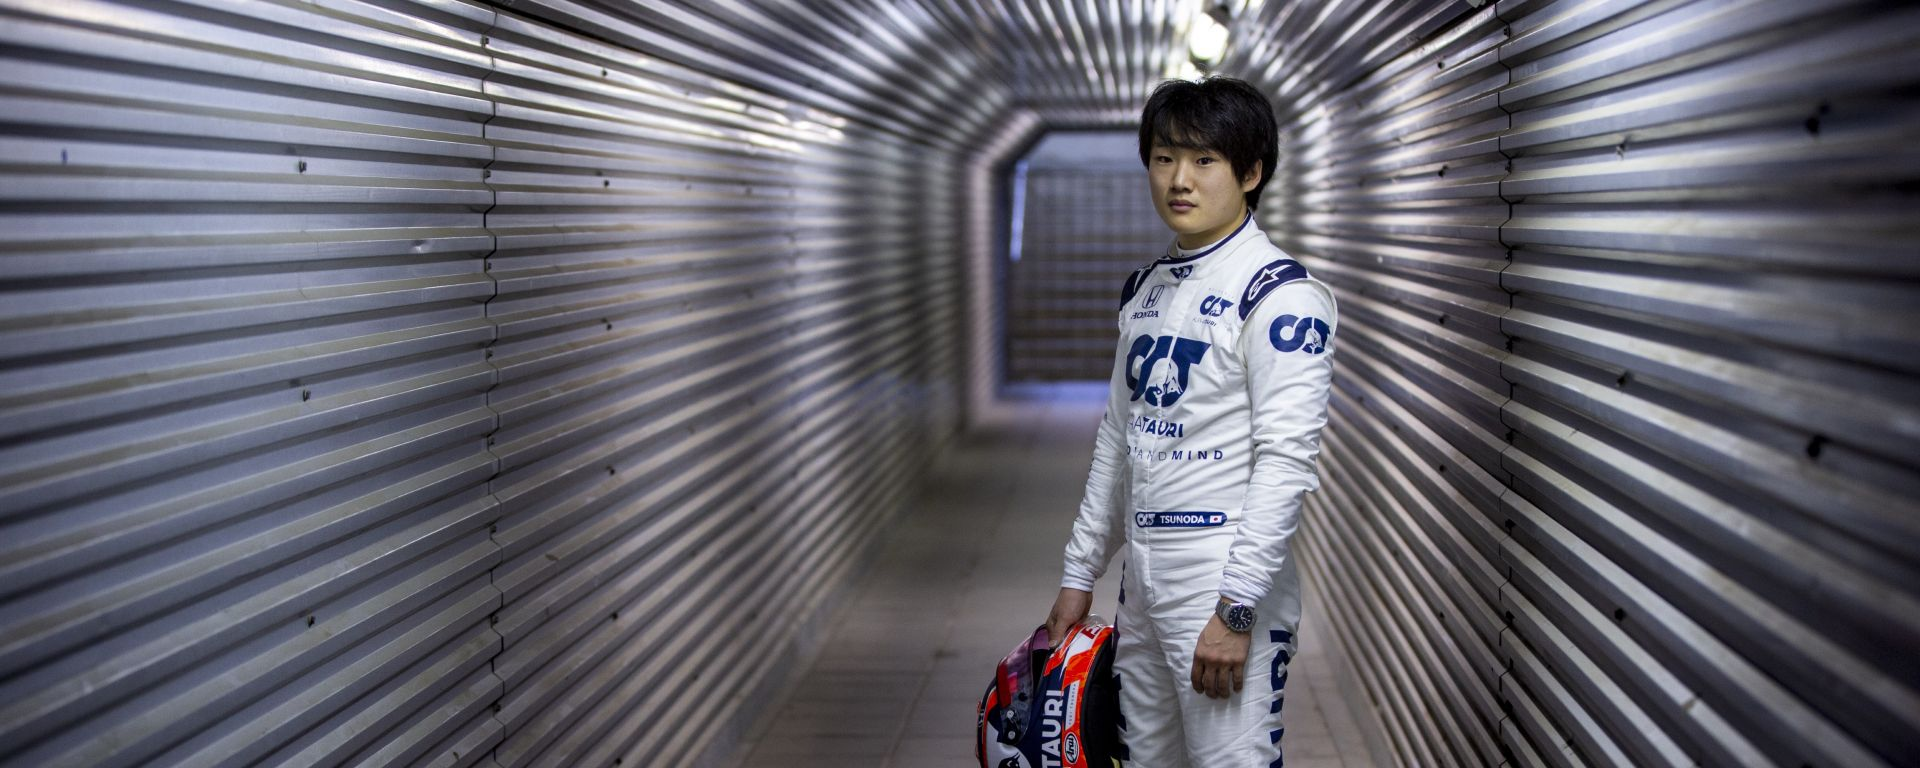 F1 2020, Test privati Imola: Yuki Tsunoda in tuta AlphaTauri